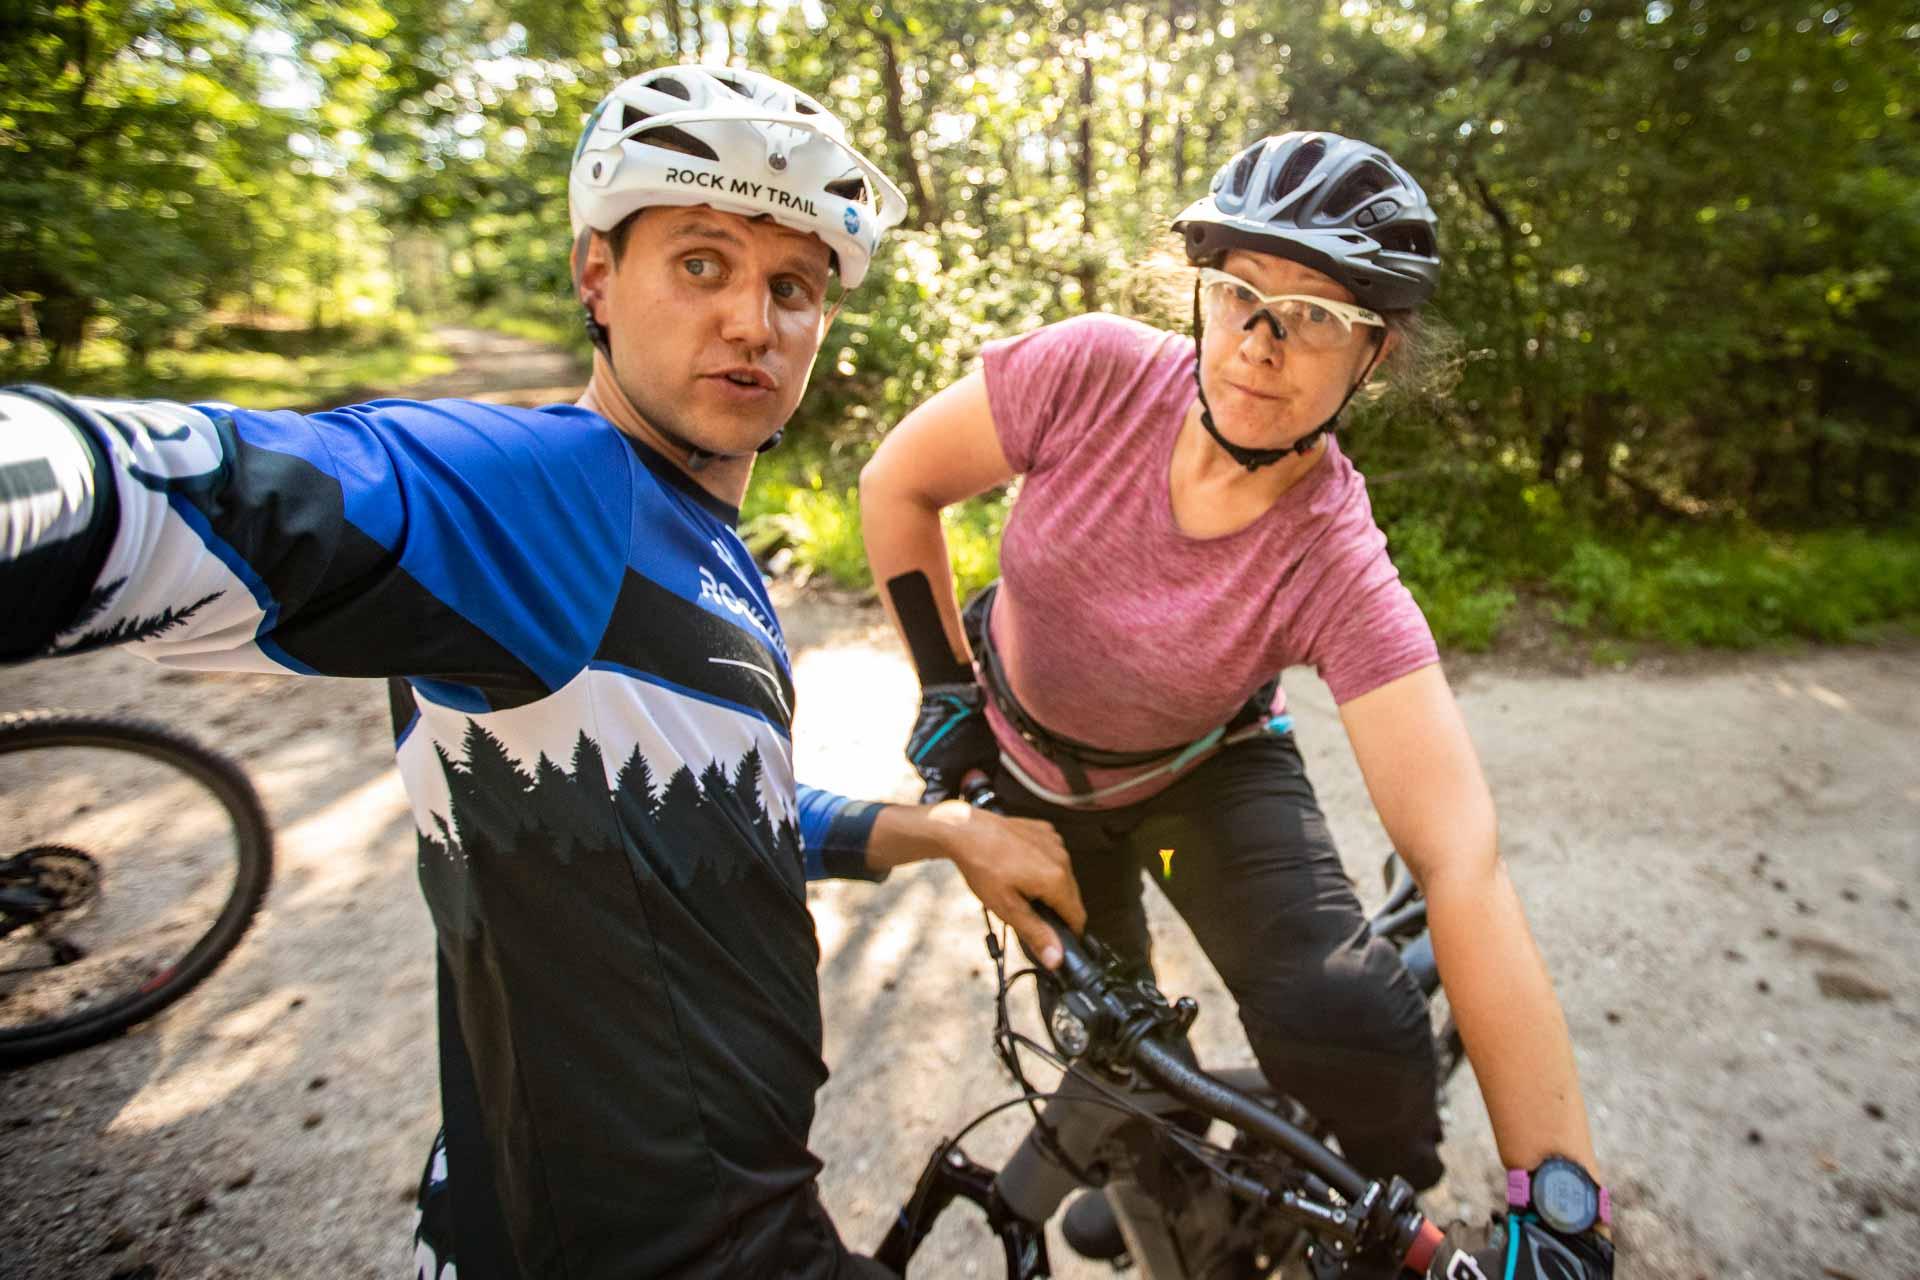 eMTB eBike Fortgeschritten Fahrtechnik Kurs in Siegen - Rock my Trail Bikeschule326